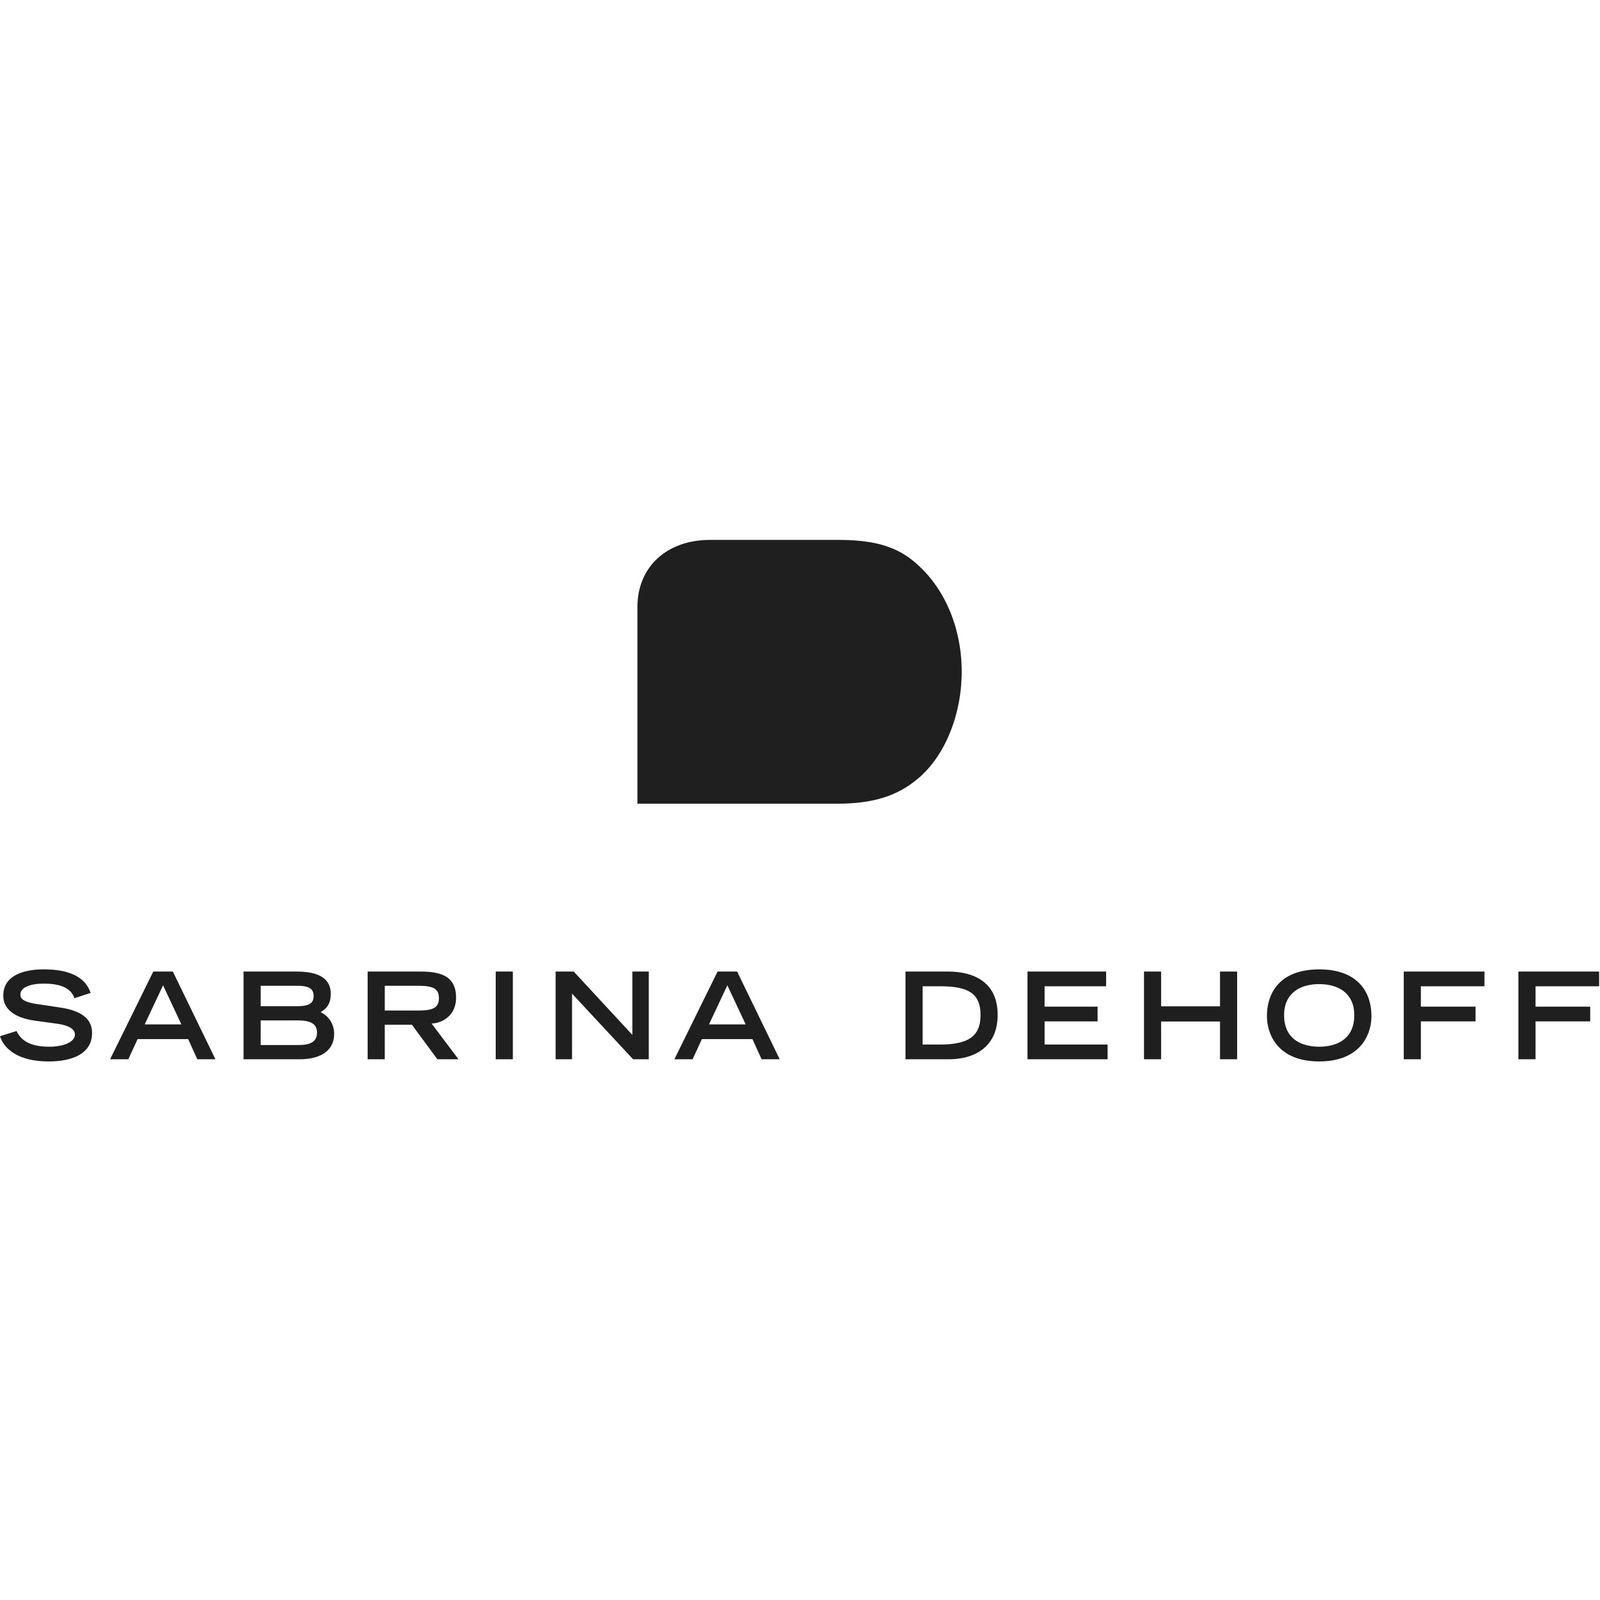 Sabrina Dehoff (Bild 1)